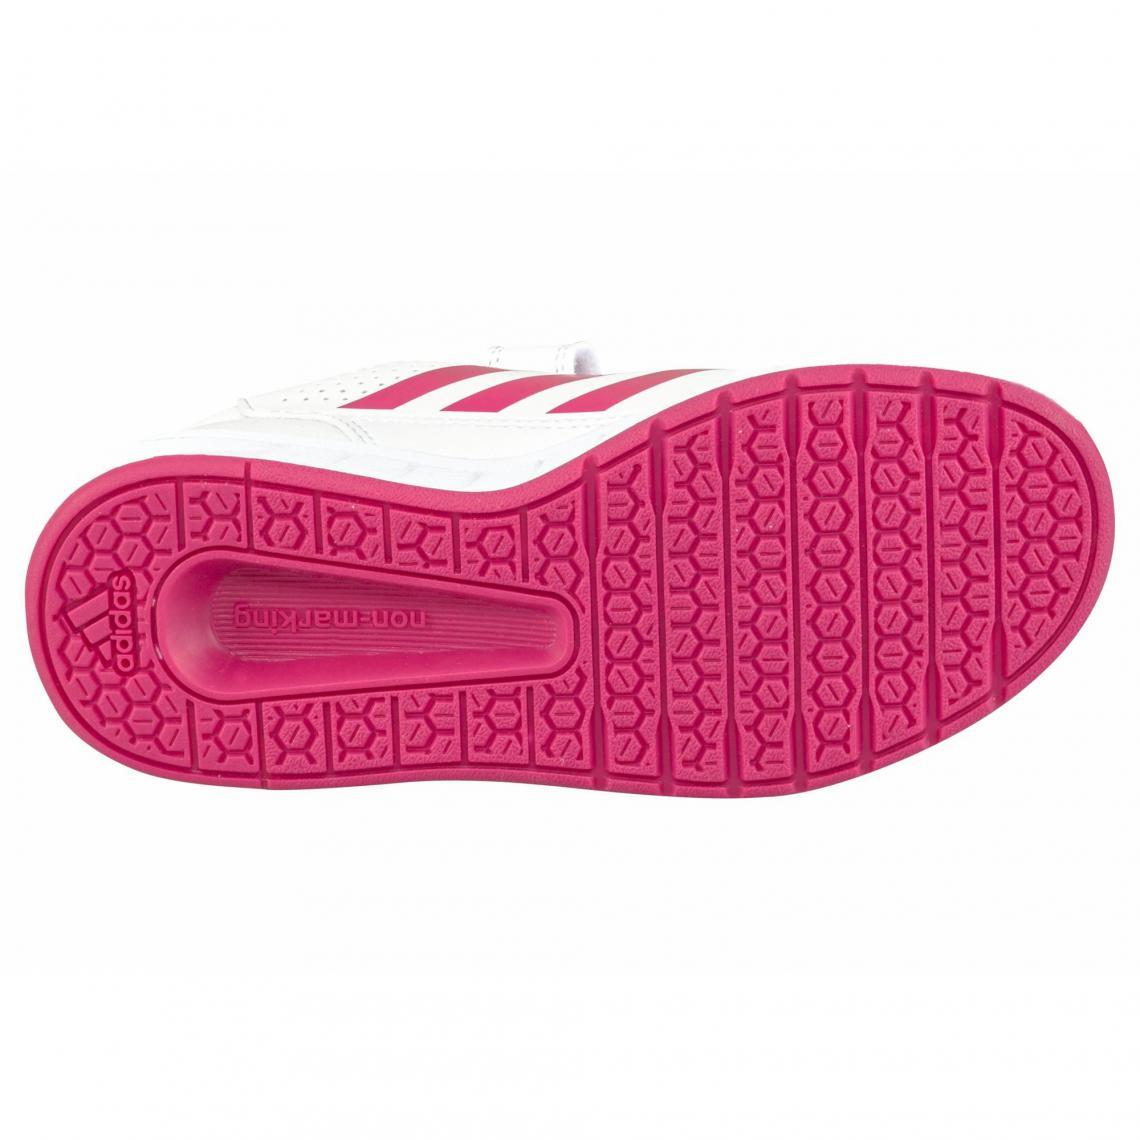 8fef3285cad31 Sneaker velcro fille AltaSport CF K adidas Performance - Blanc - Rose Vif  Adidas Performance